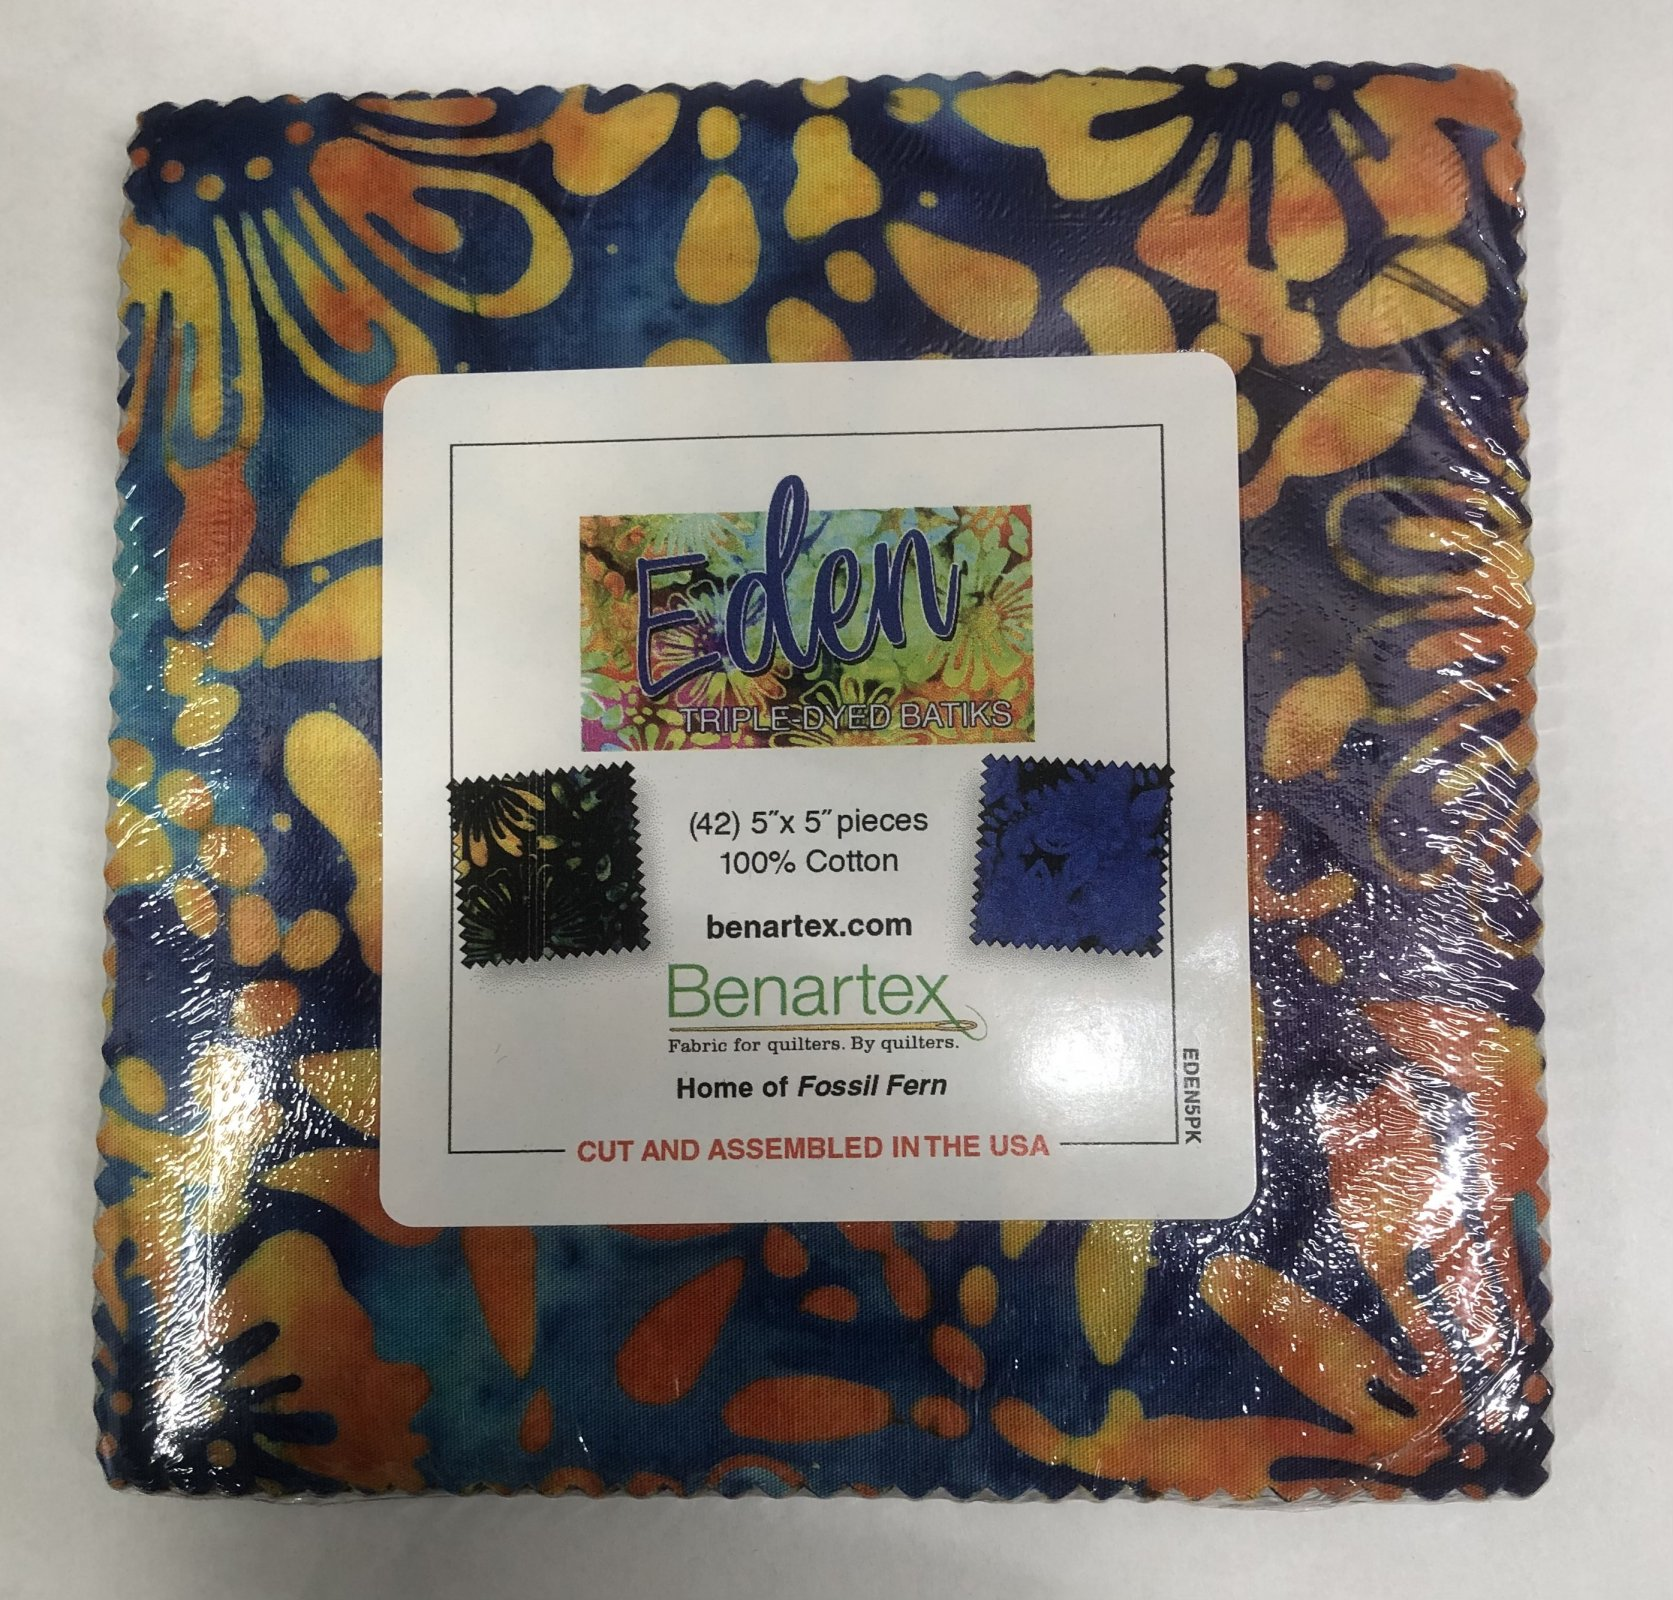 Eden:  5 x 5 Squares - 42 piece Triple-Dyed Batiks Fabric Square Pack from Benartex